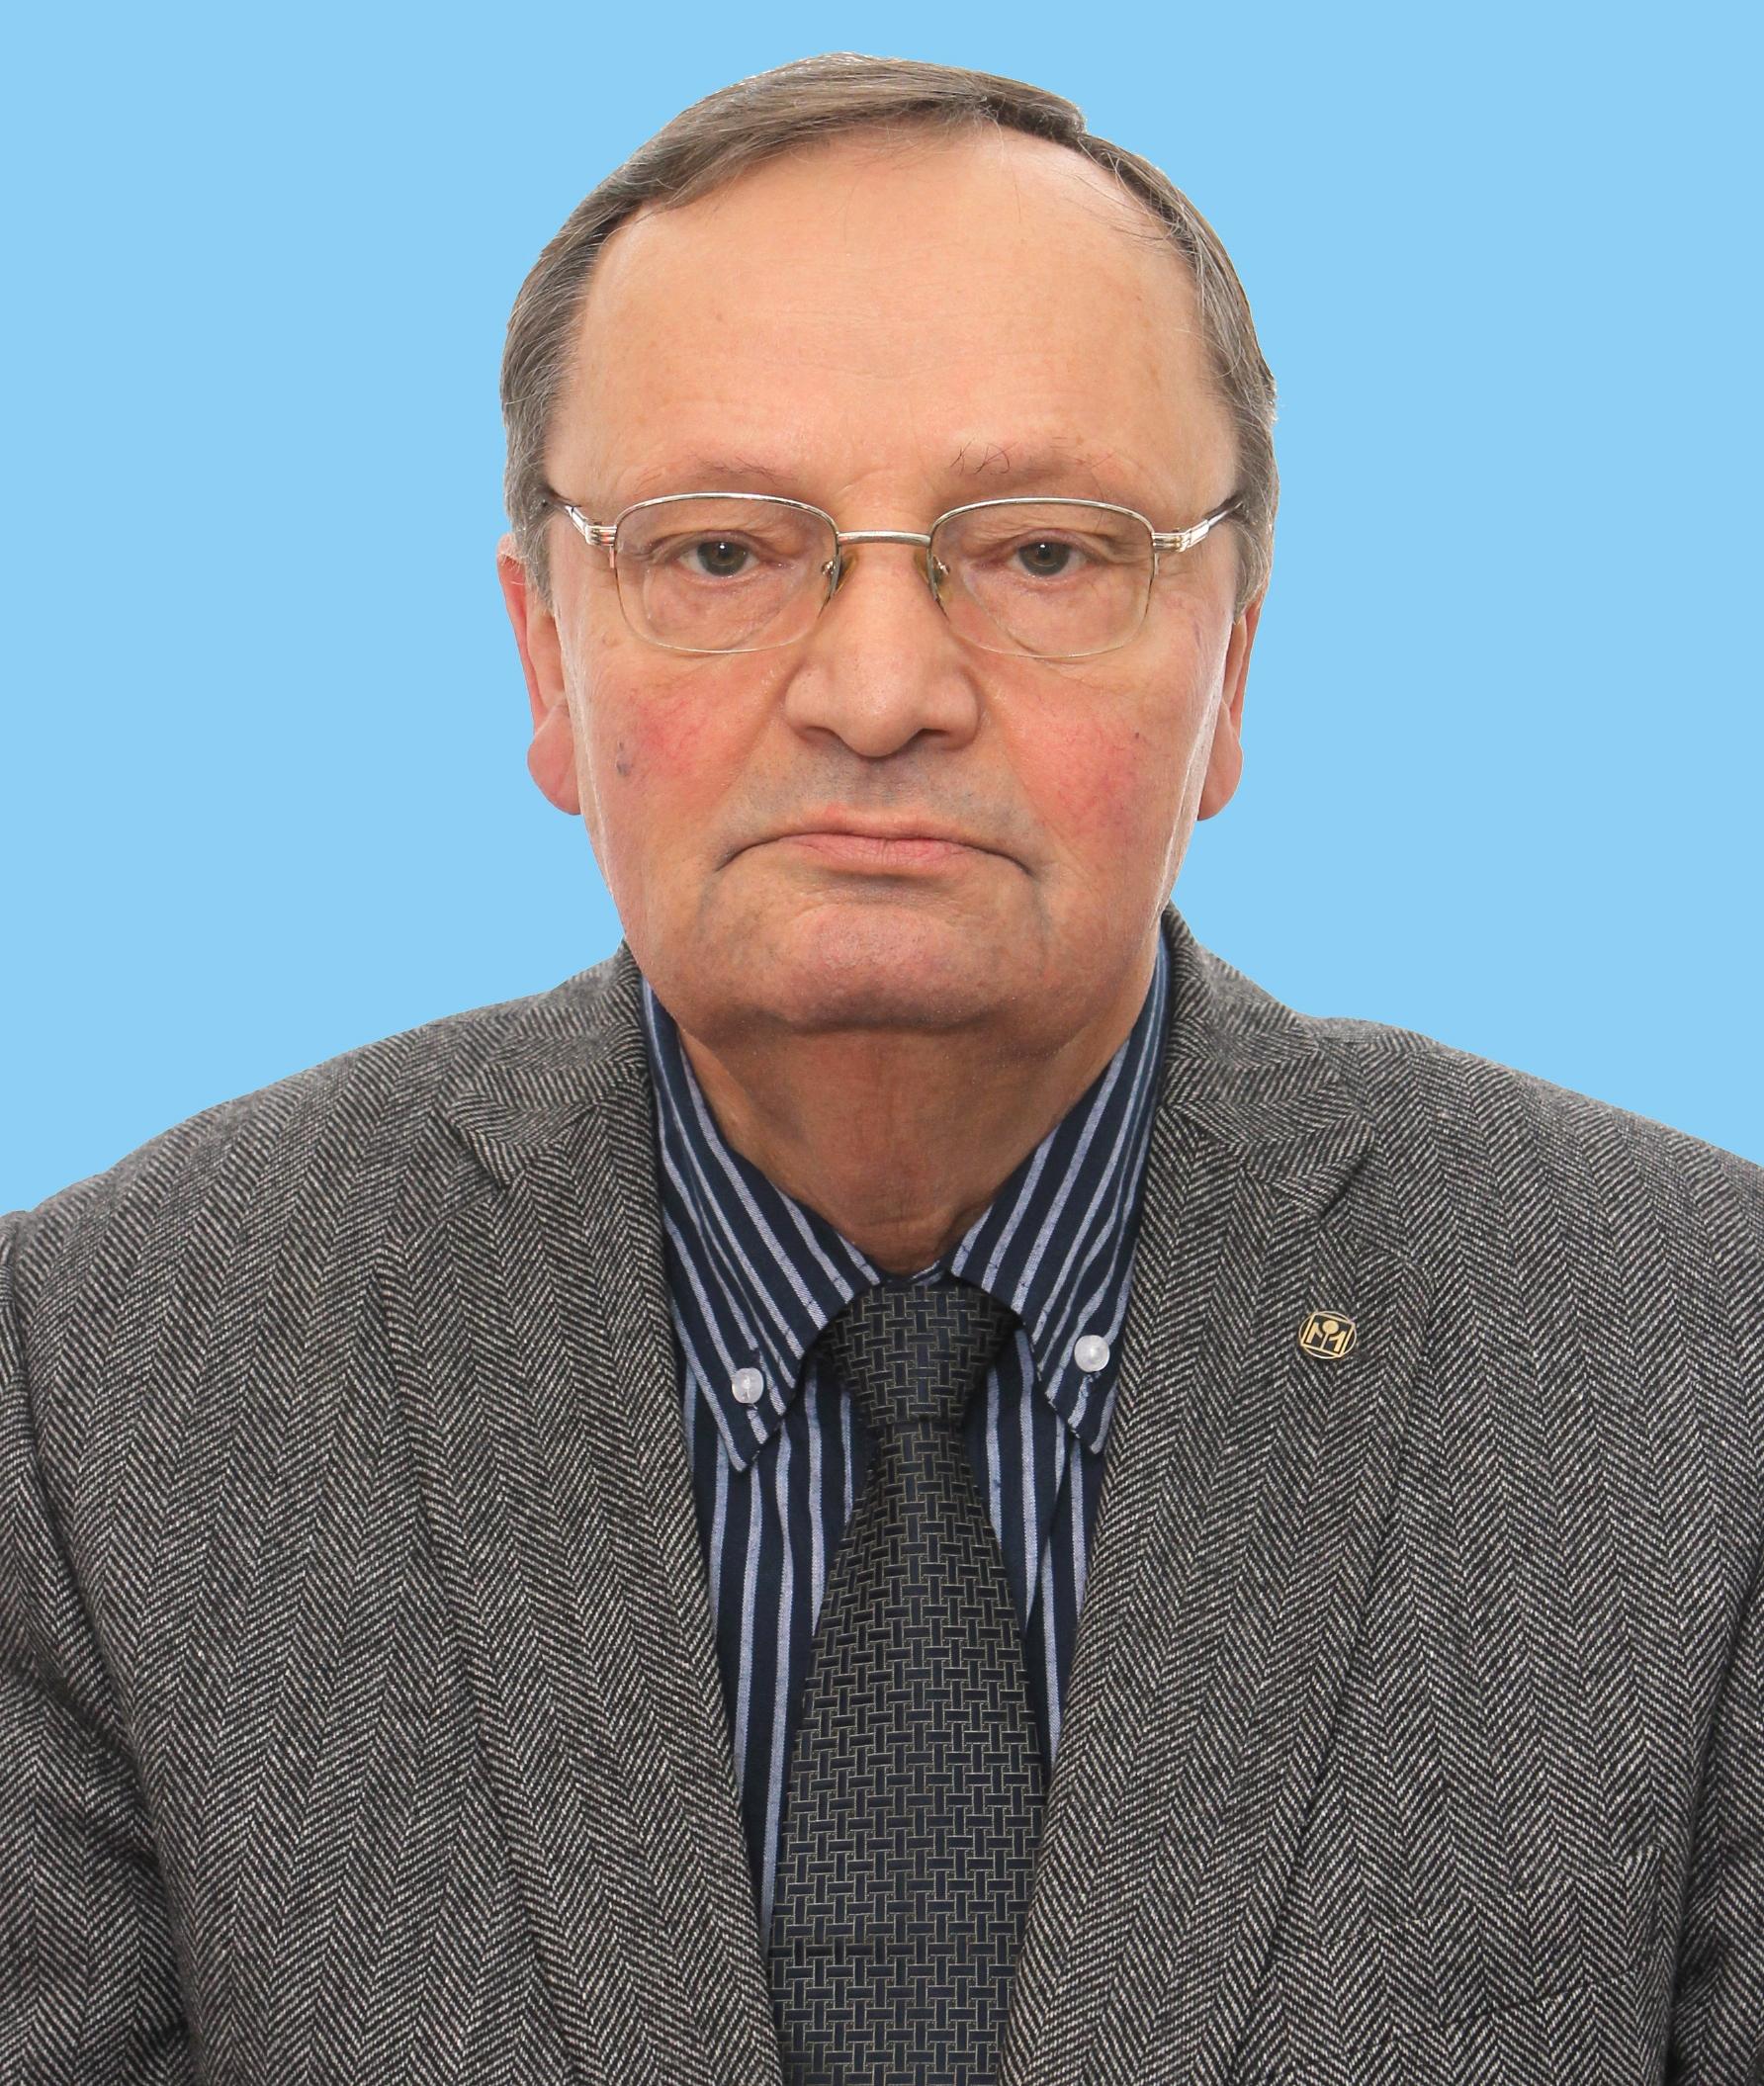 Инатович Юрий Владимирович